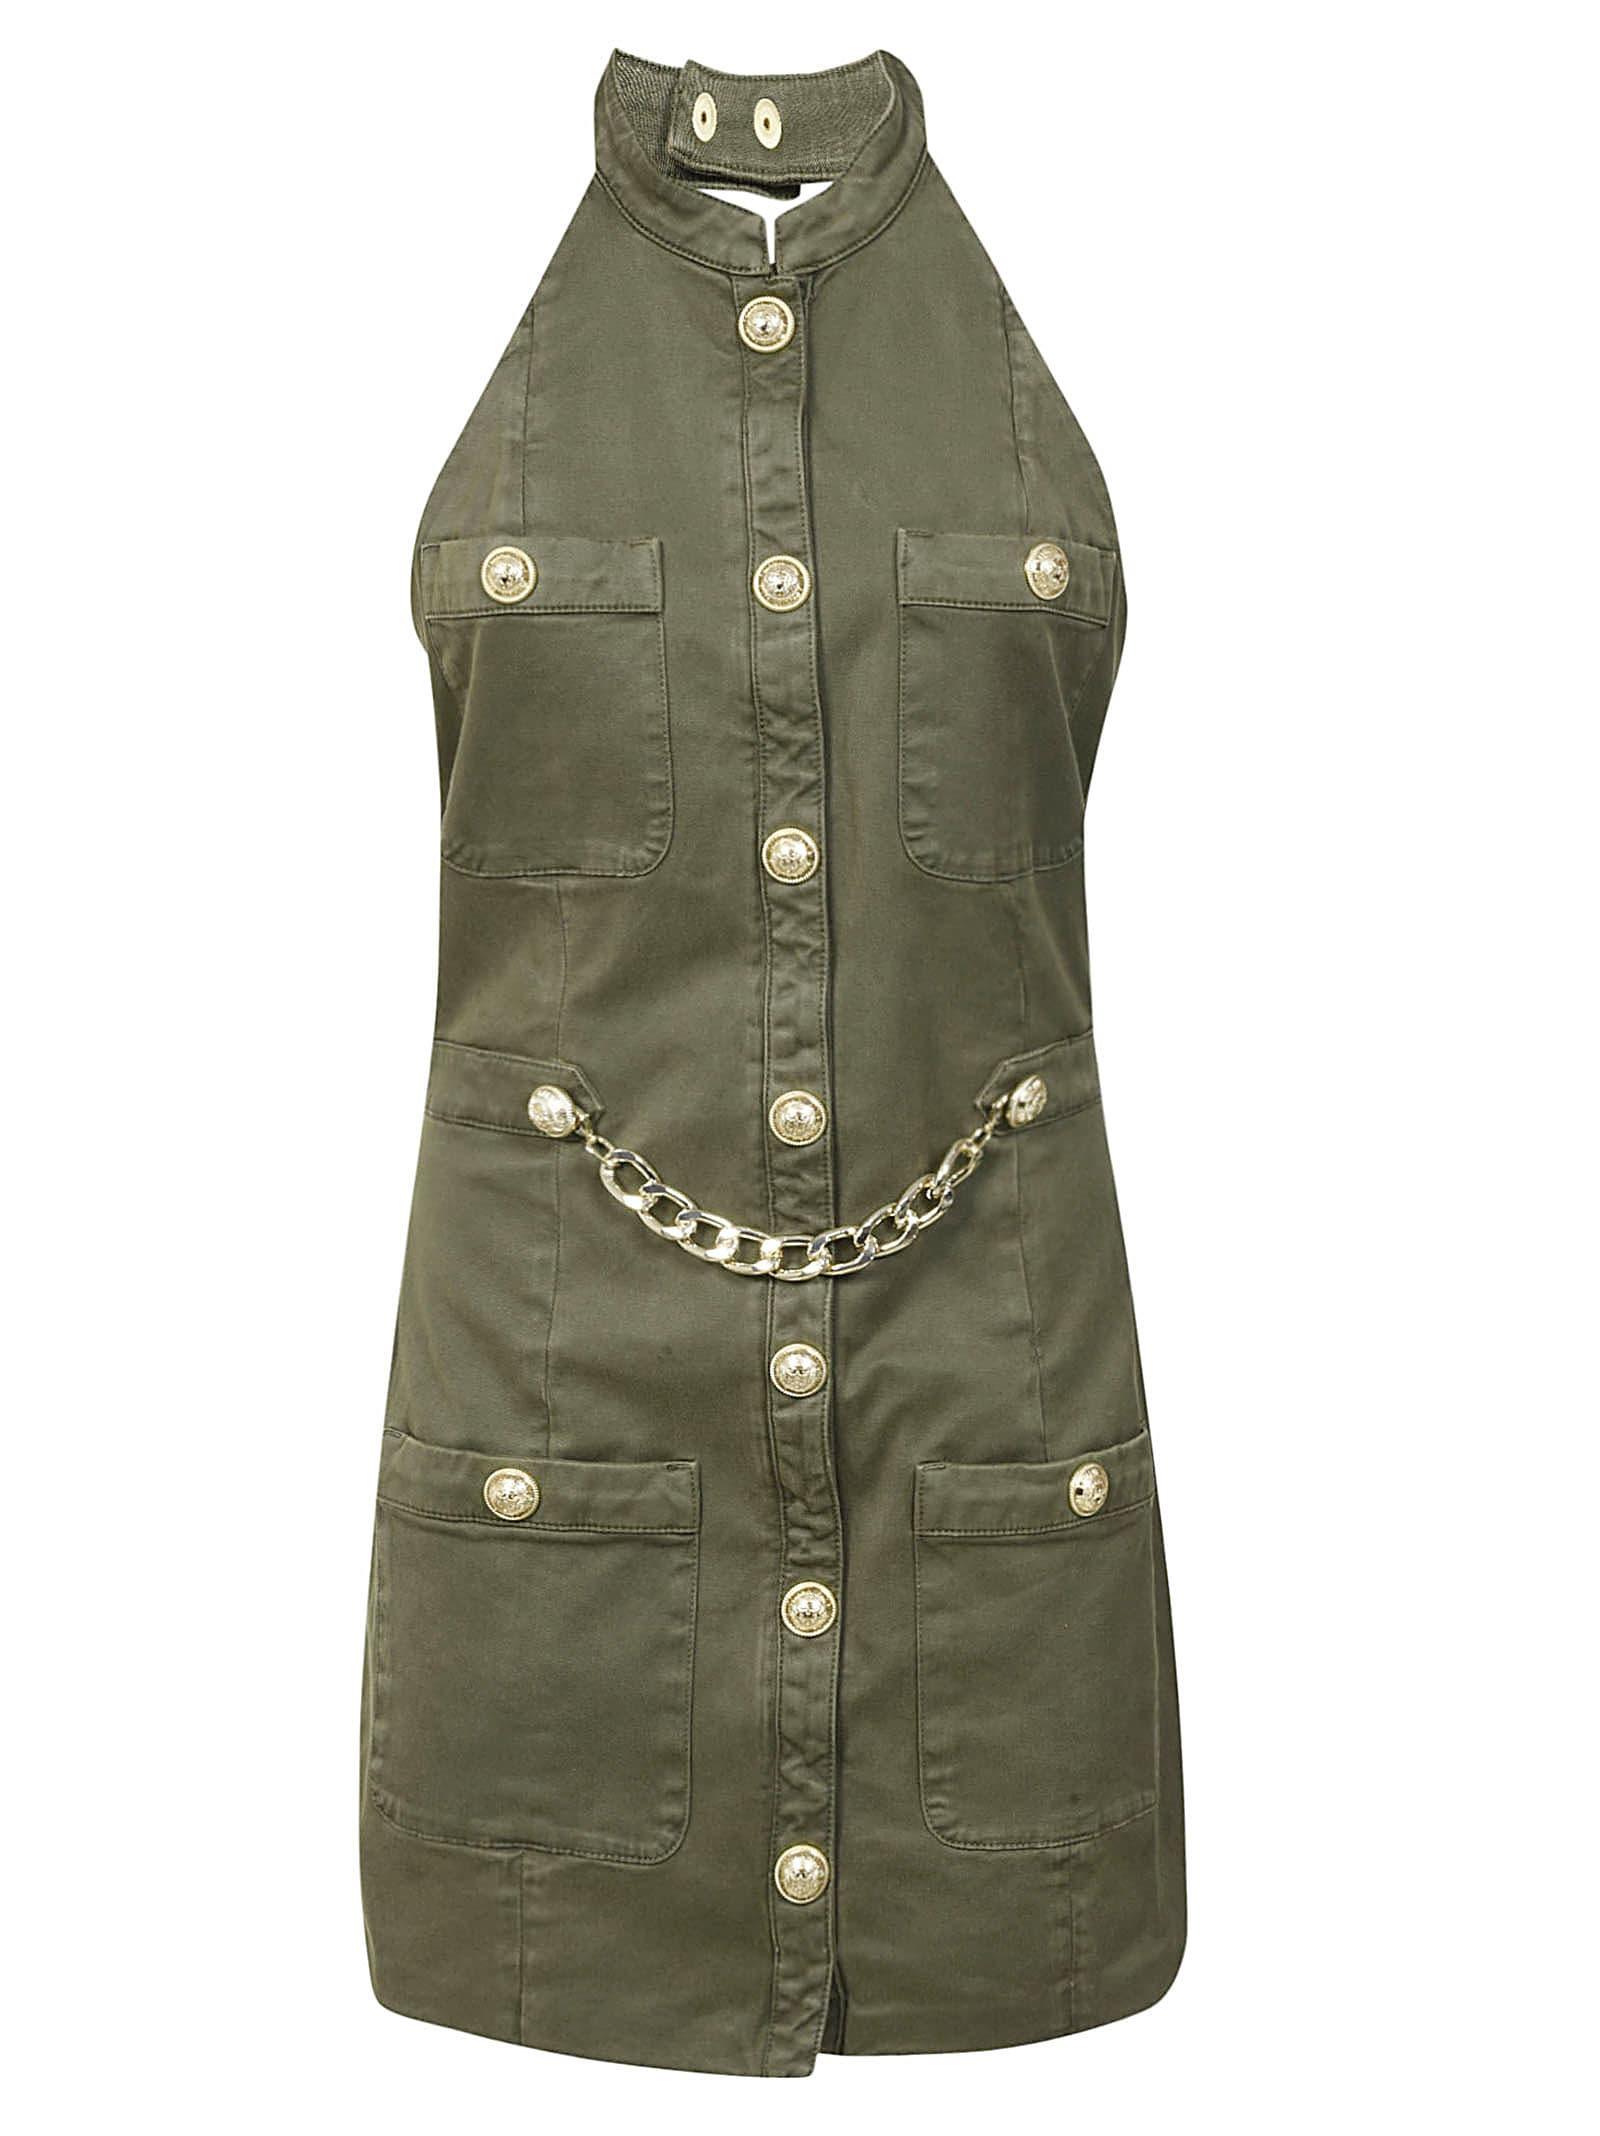 Buy Balmain Embellished Sleeveless Dress online, shop Balmain with free shipping